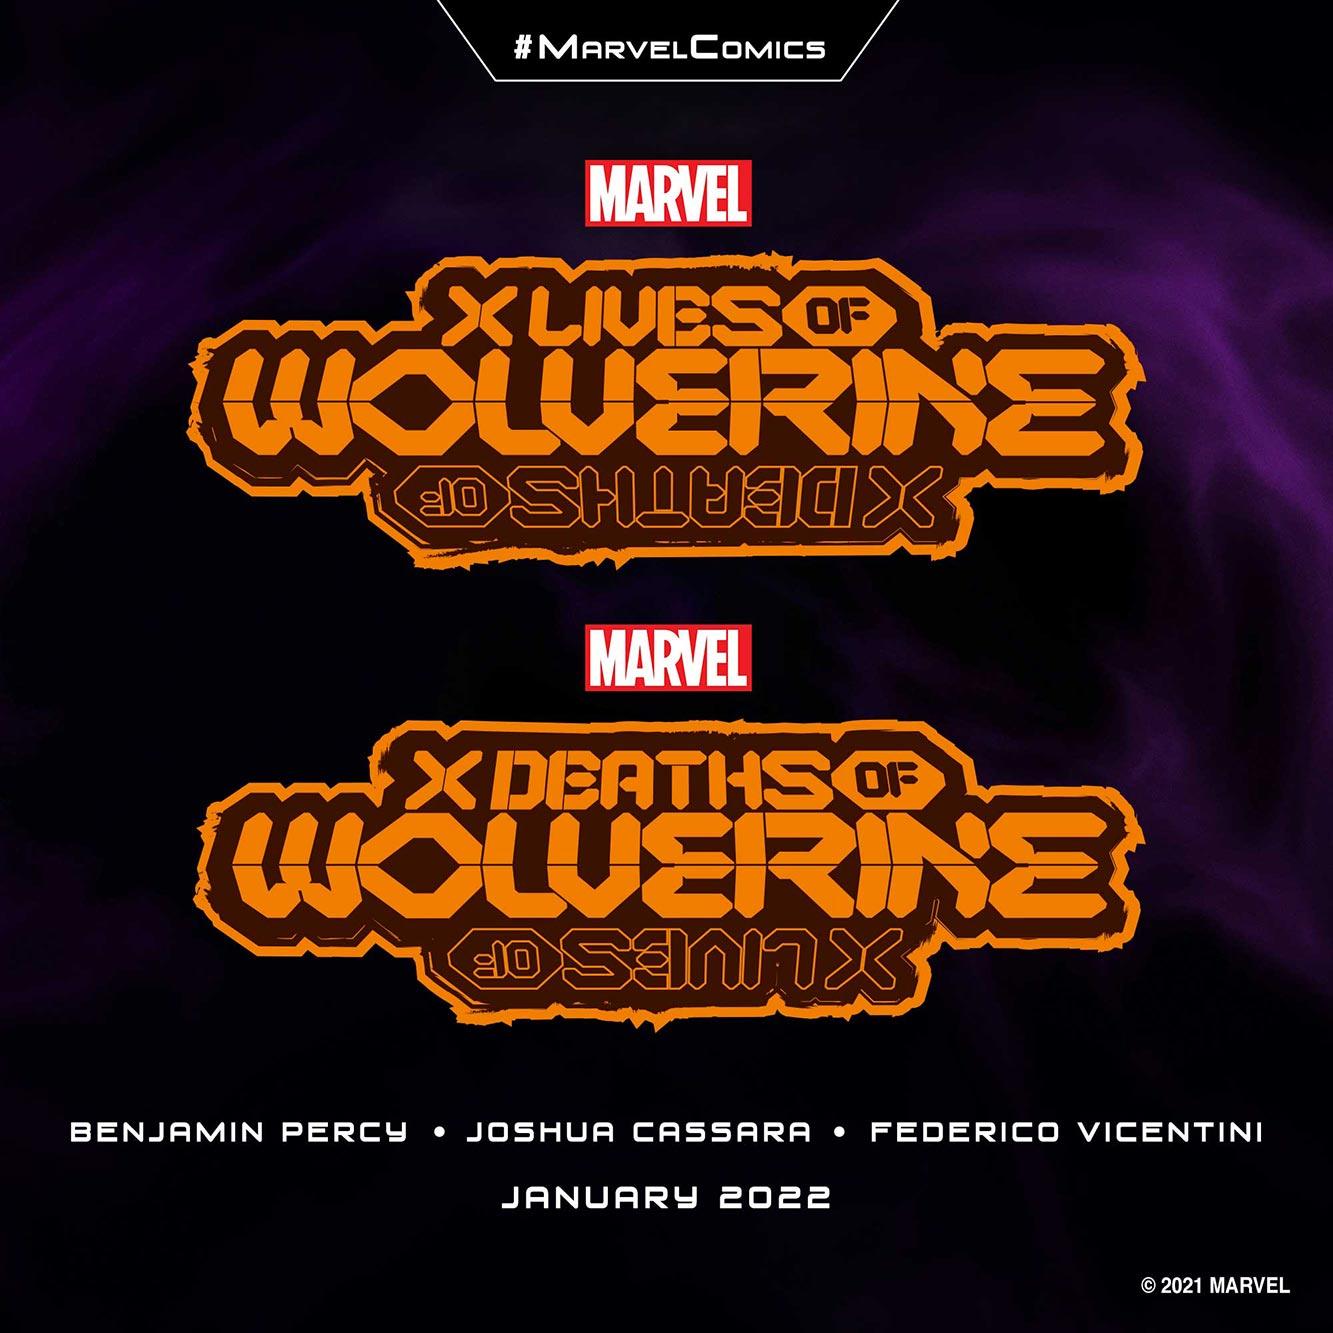 Wolverine CR: Marvel Comics